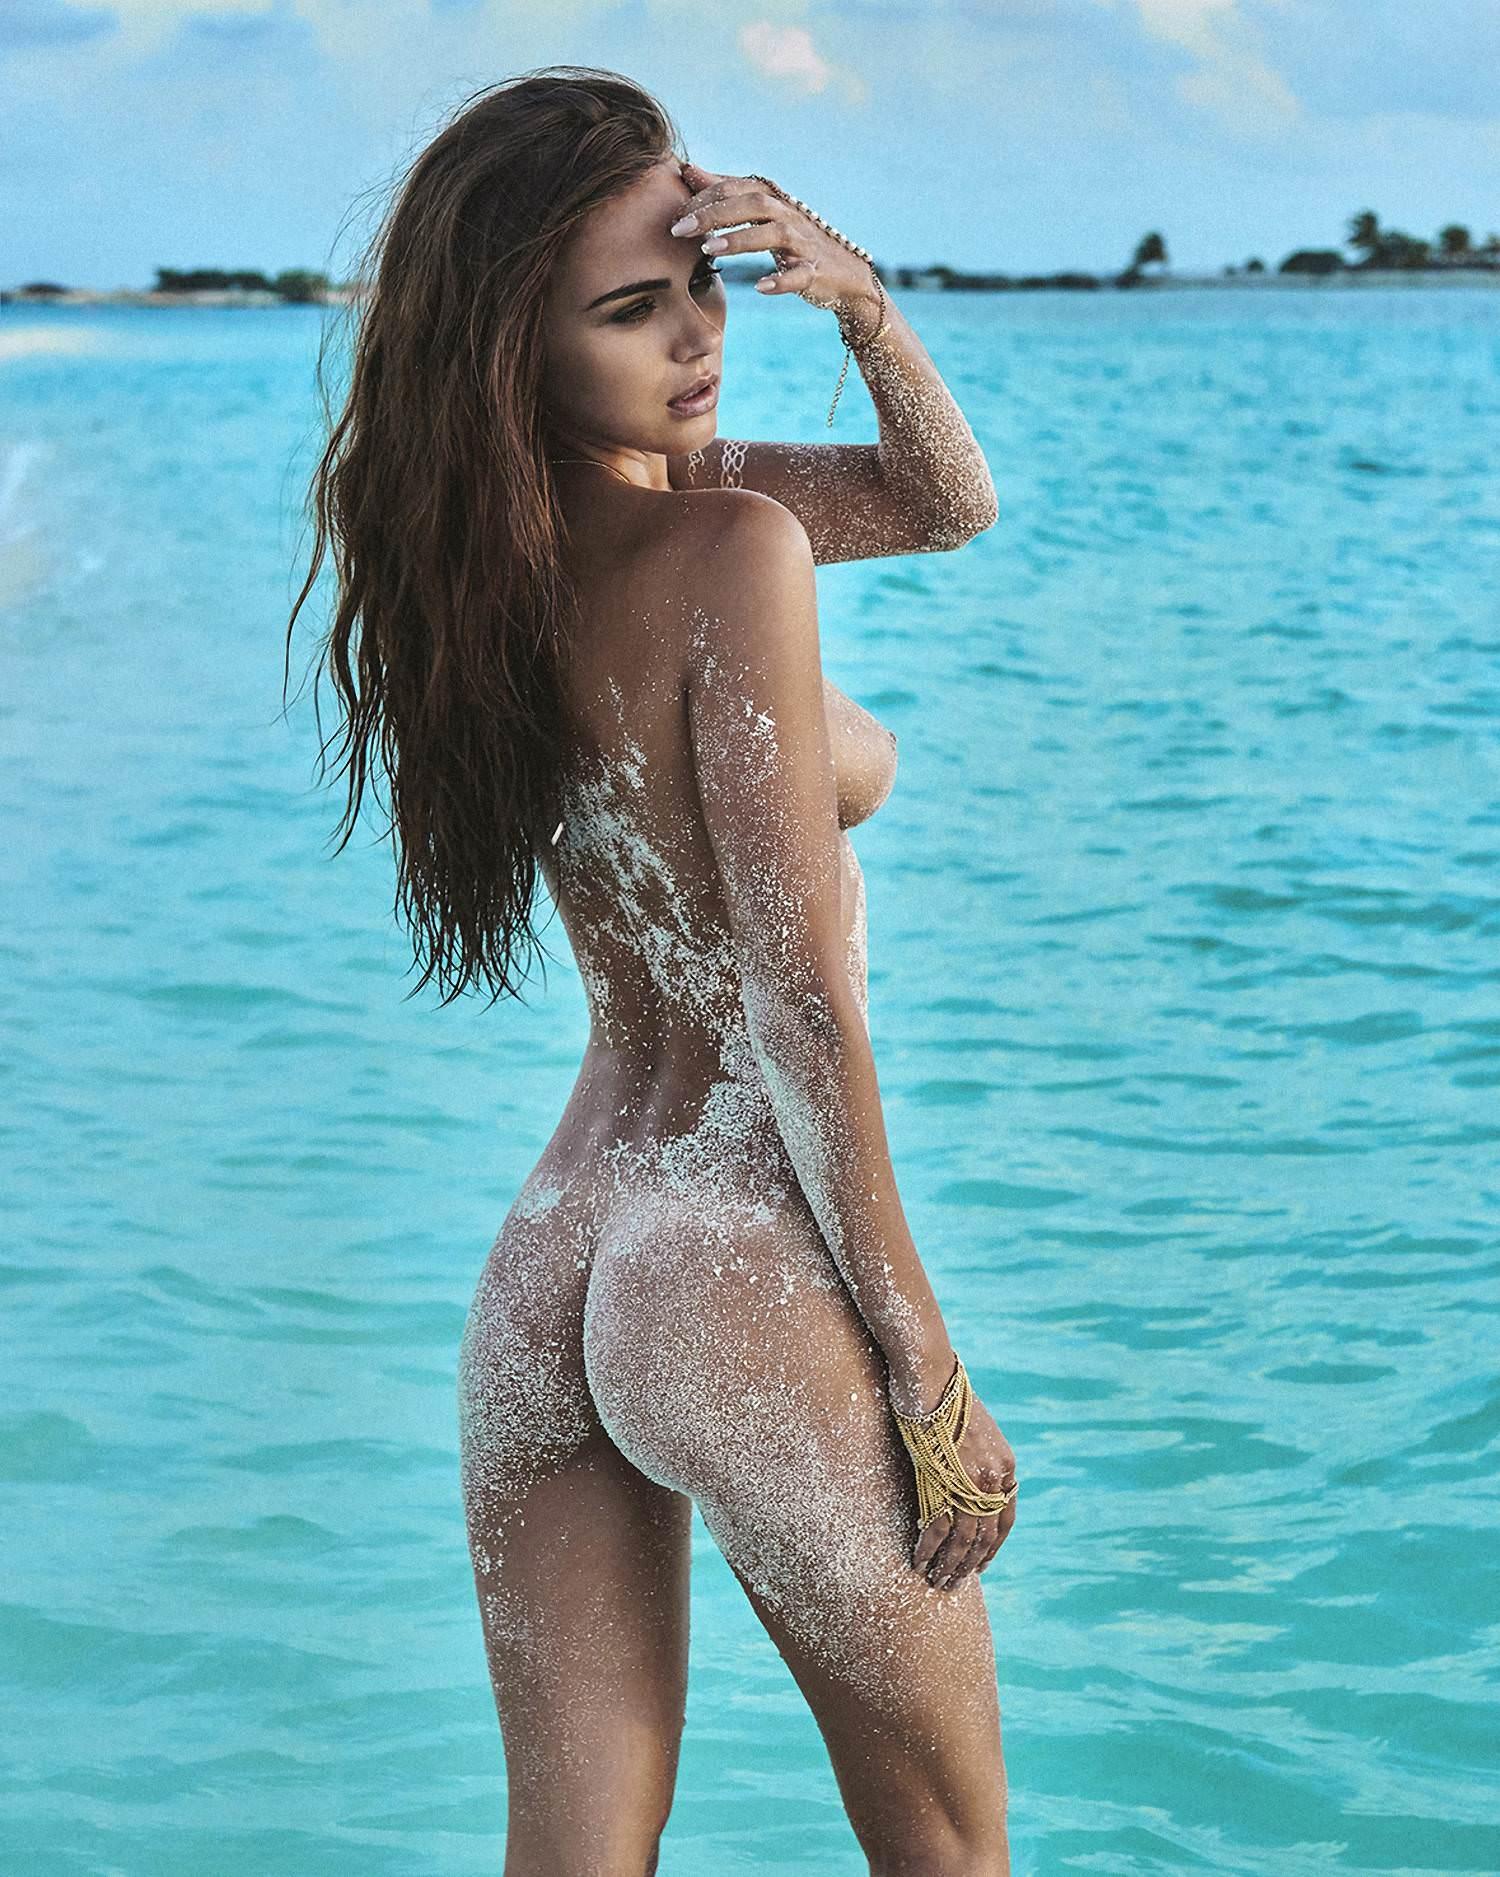 Image 3: Xenia Deli L ex copine de Justin Bieber seins nus sur une plage